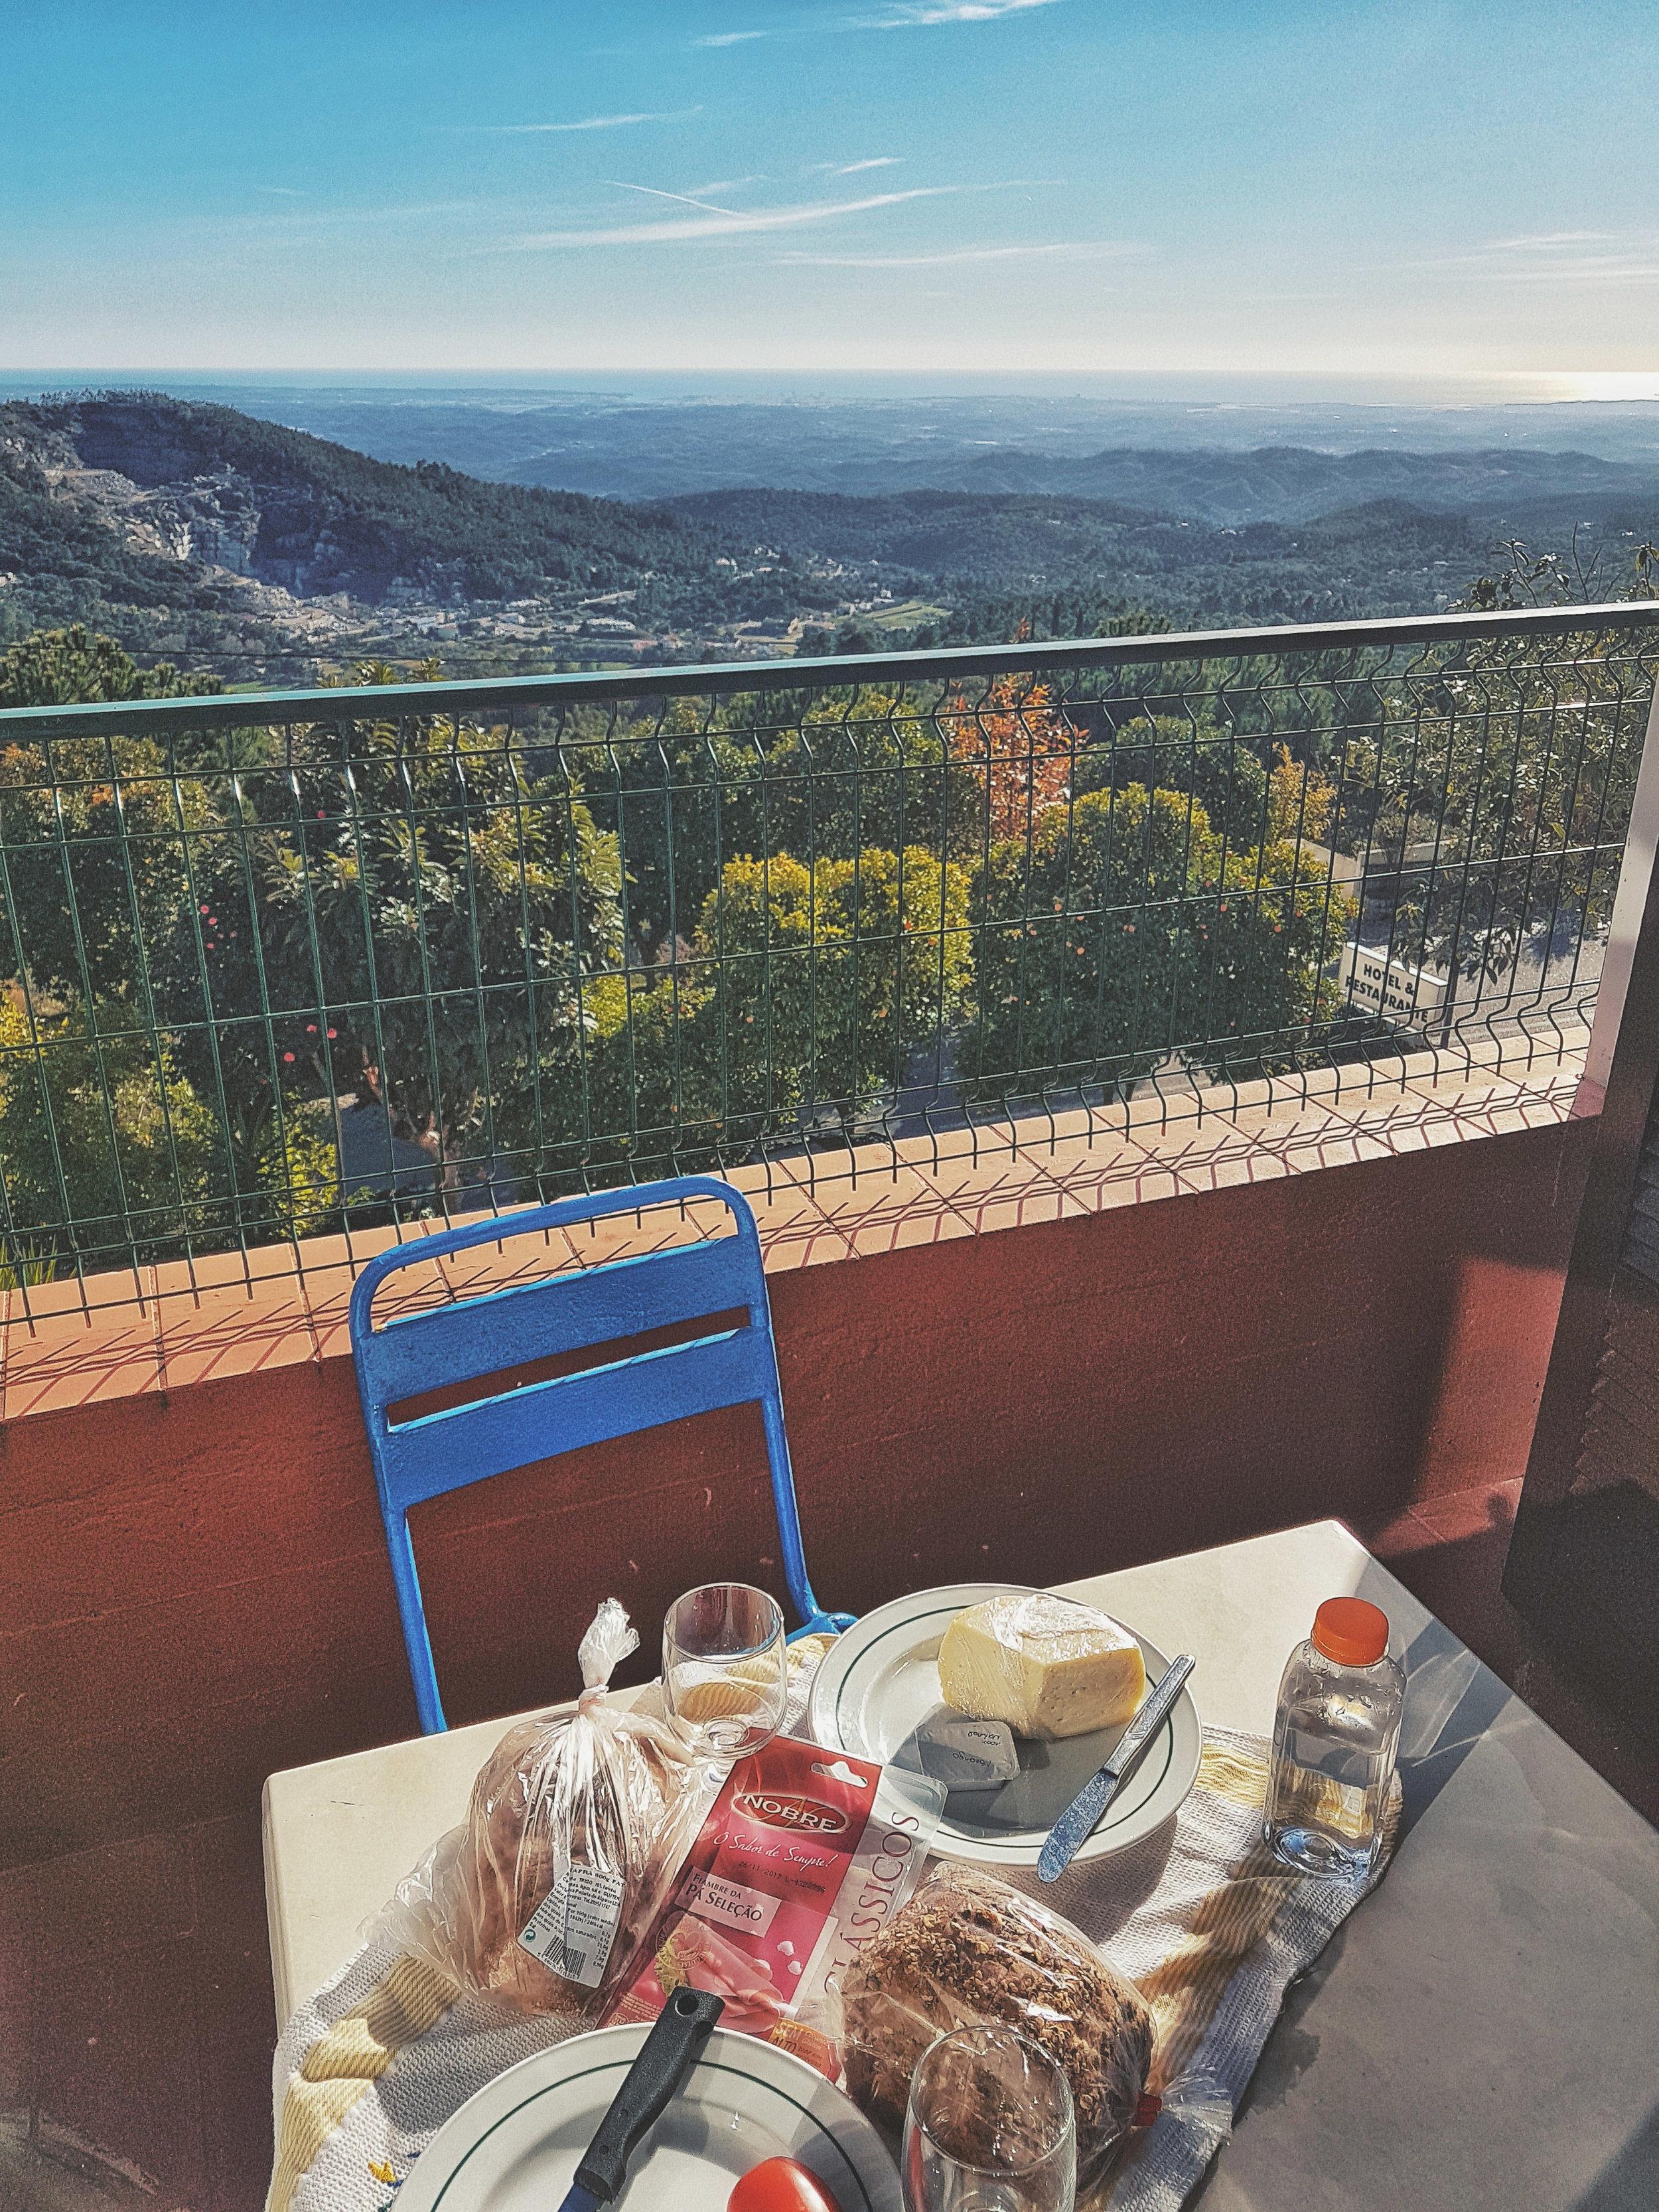 estalagem abrigo da montanha monchique portugal. lunch with a view. great view. great food. algarve. balcony with a view..jpg